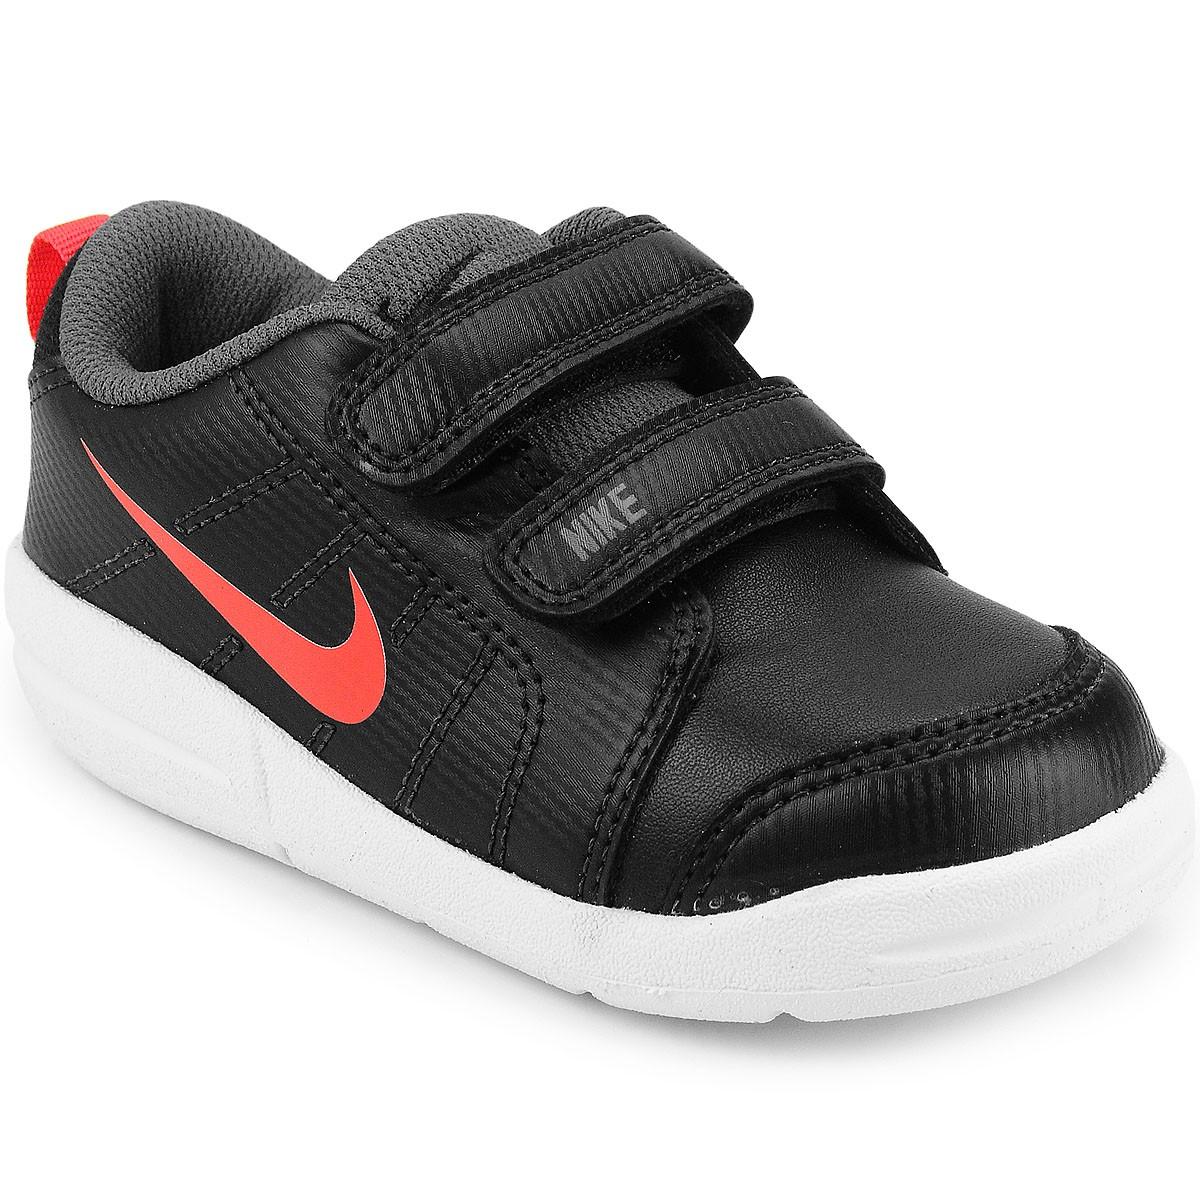 dd8cee19d5 Tênis Nike Pico LT PSV 619042